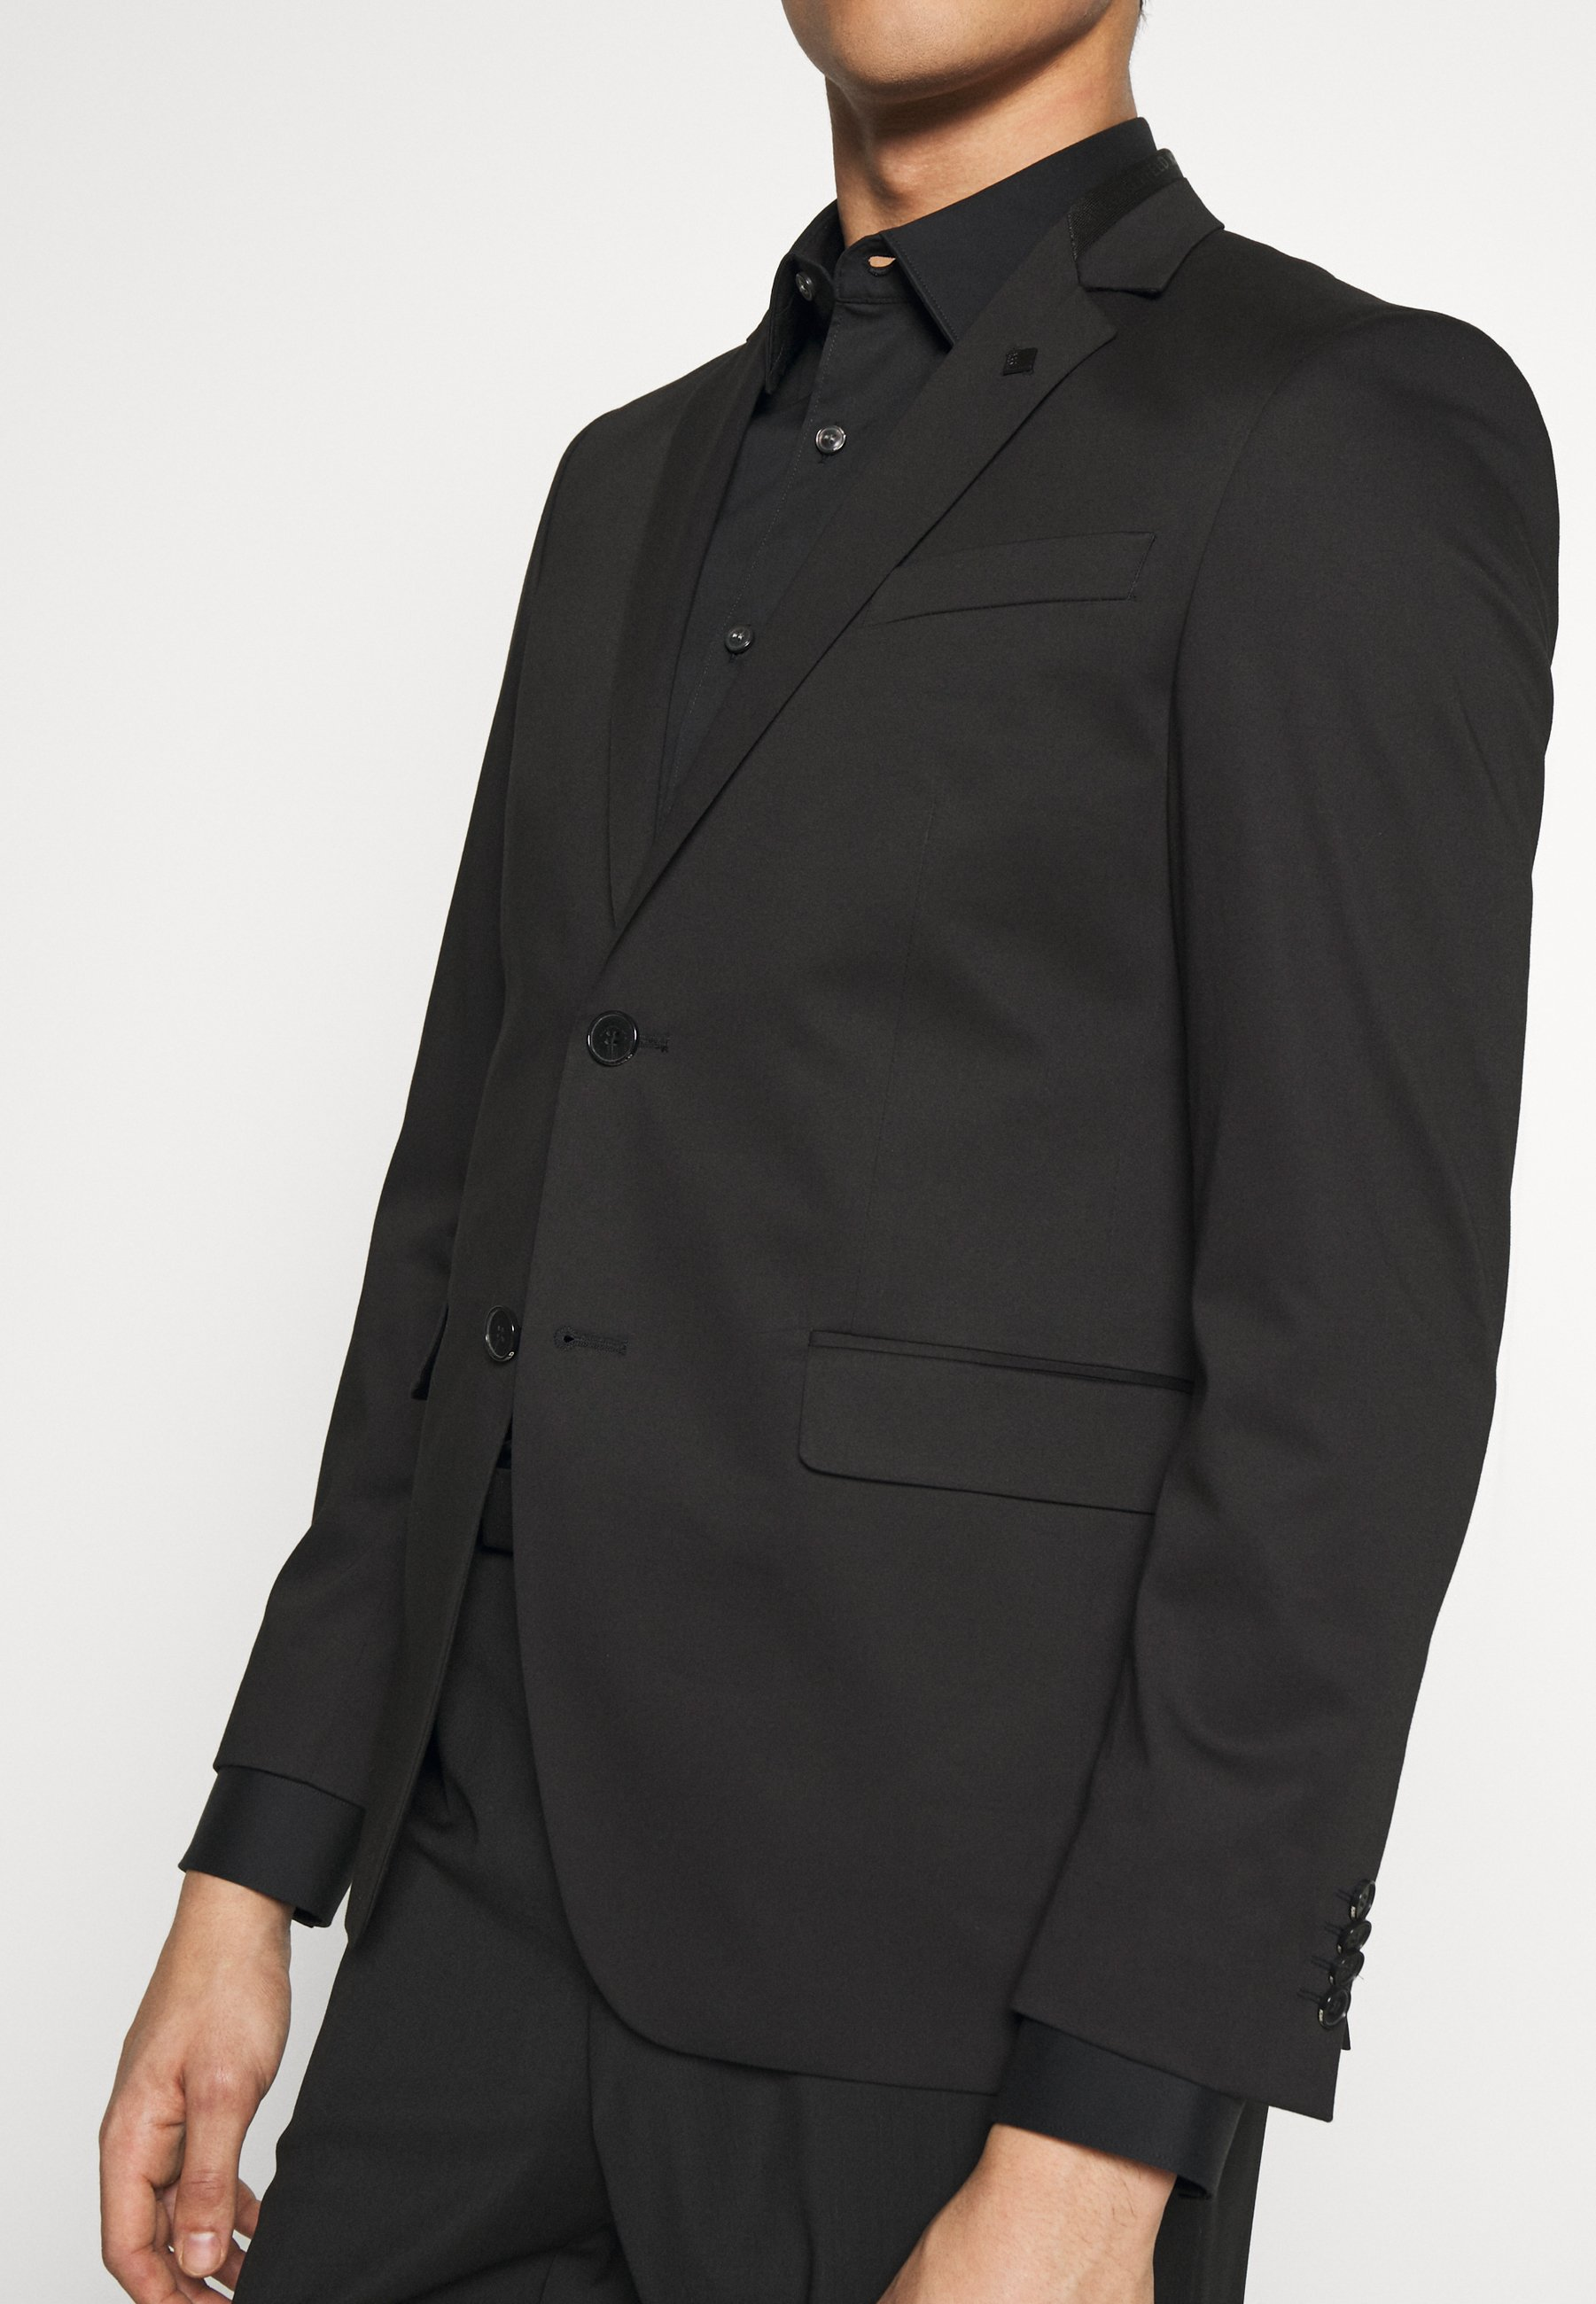 KARL LAGERFELD JACKET STAGE - Veste de costume - black